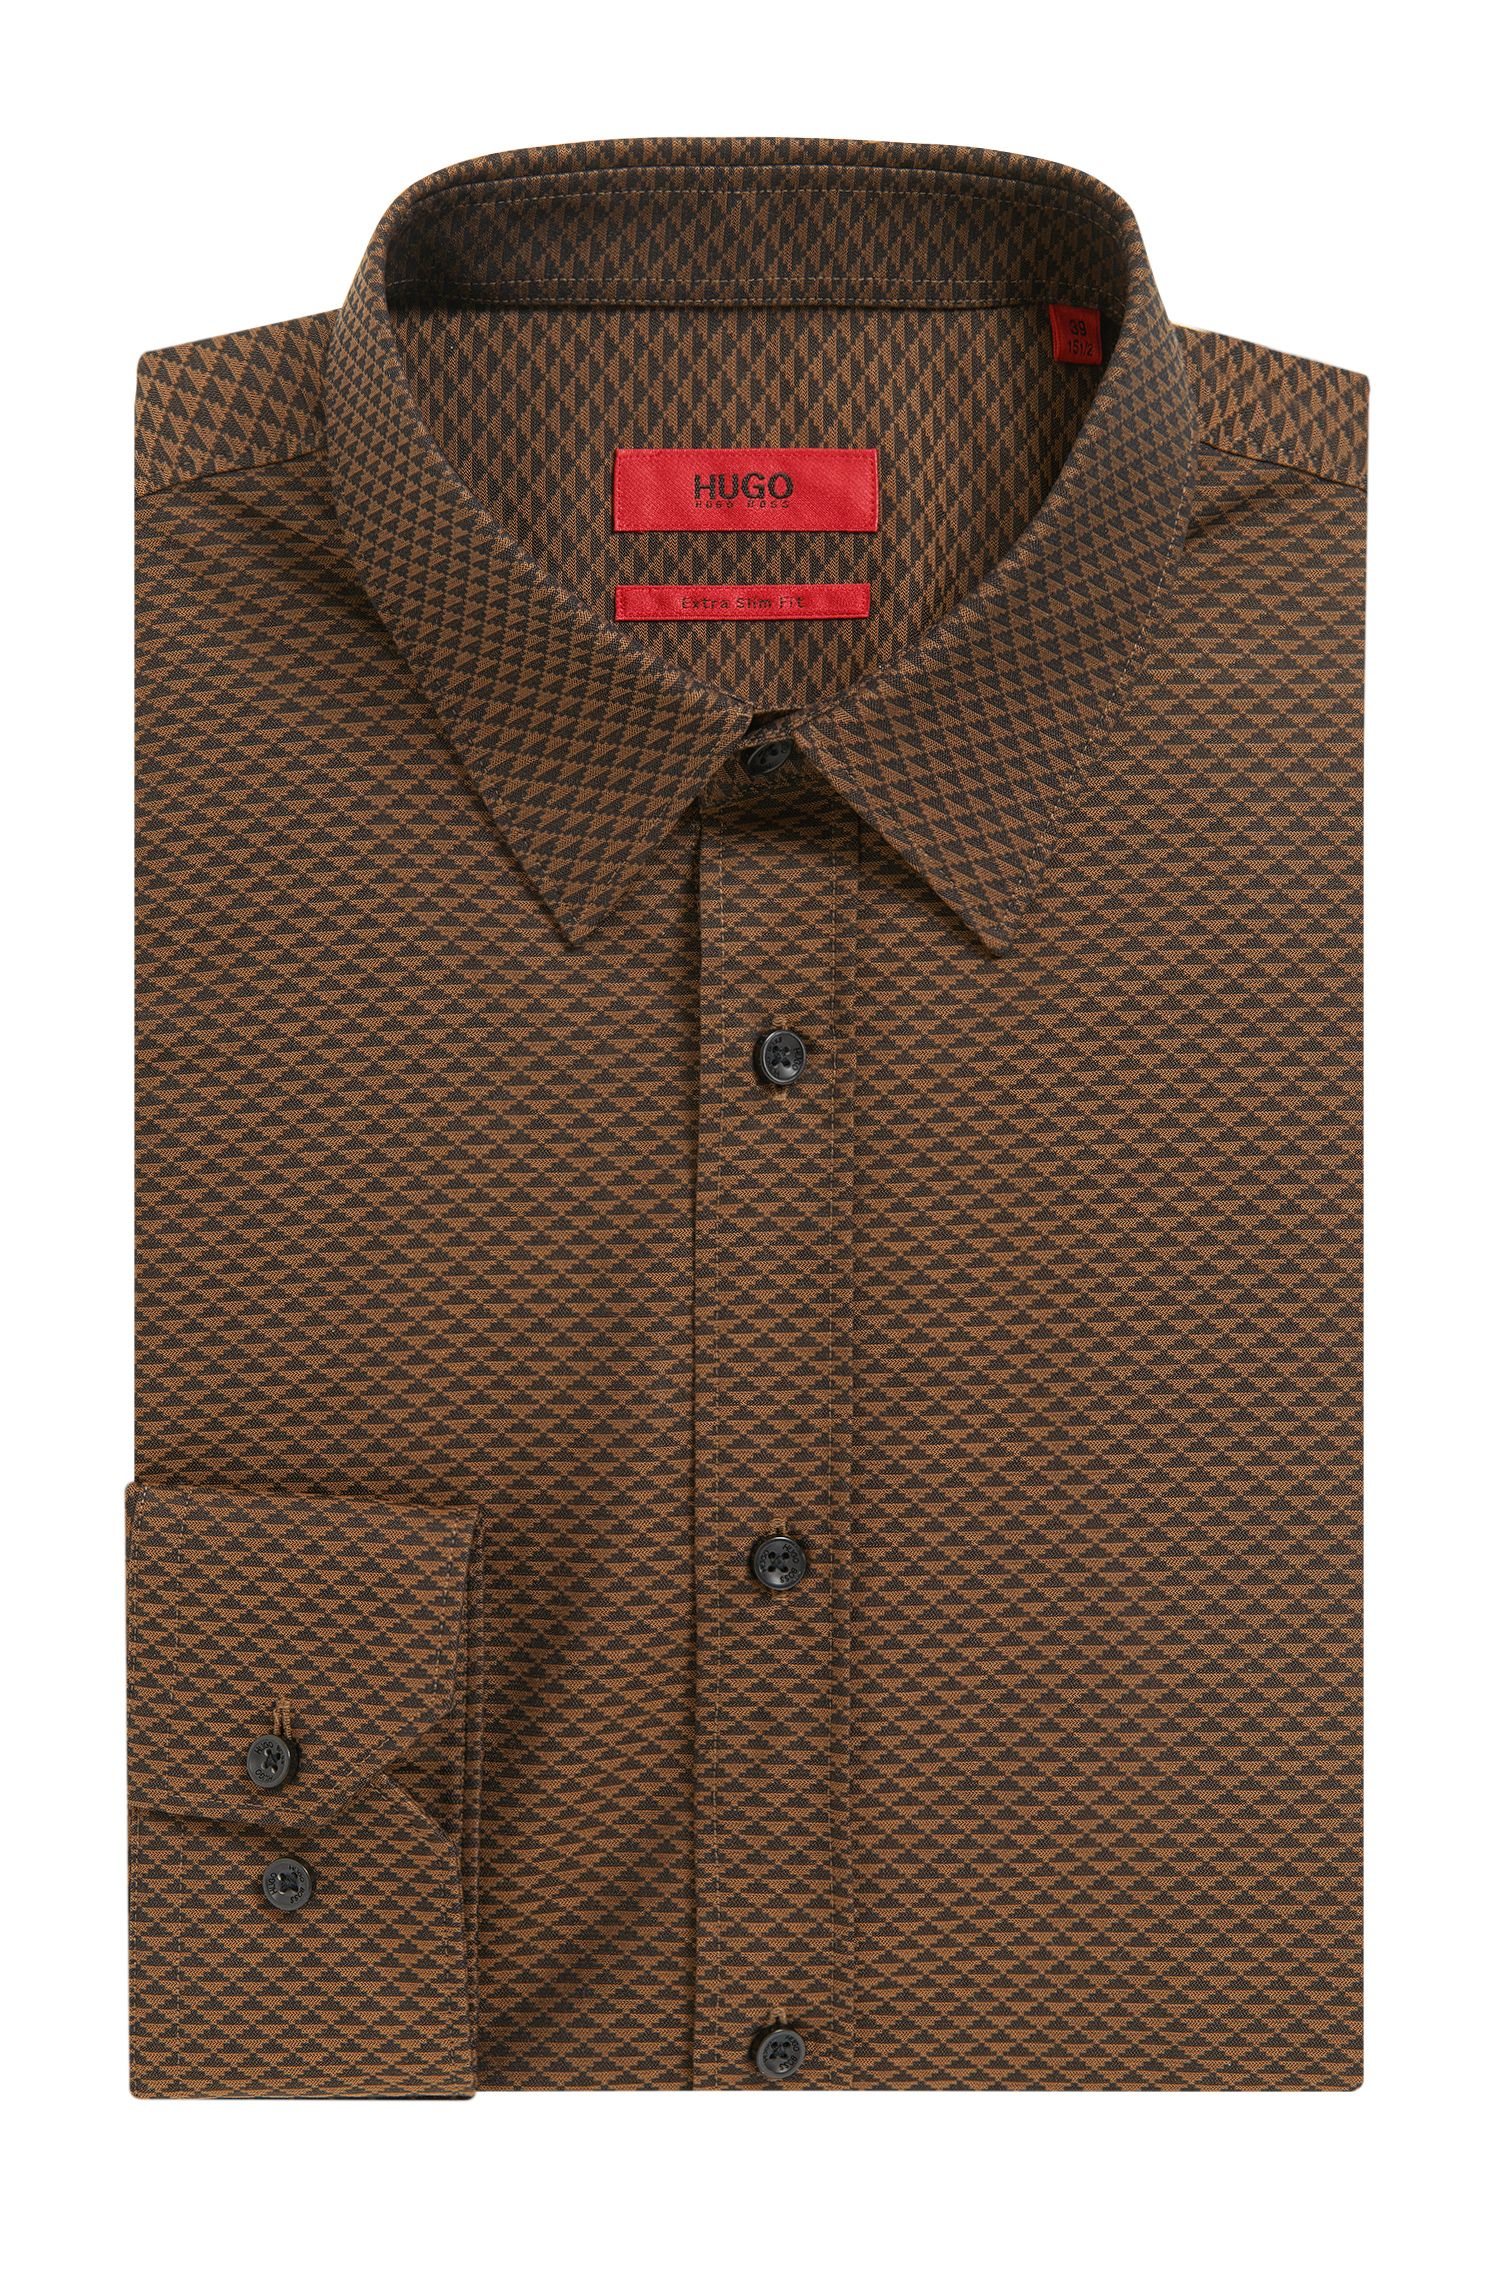 Patterned Cotton Button Down Shirt. Extra Slim Fit | Elisha